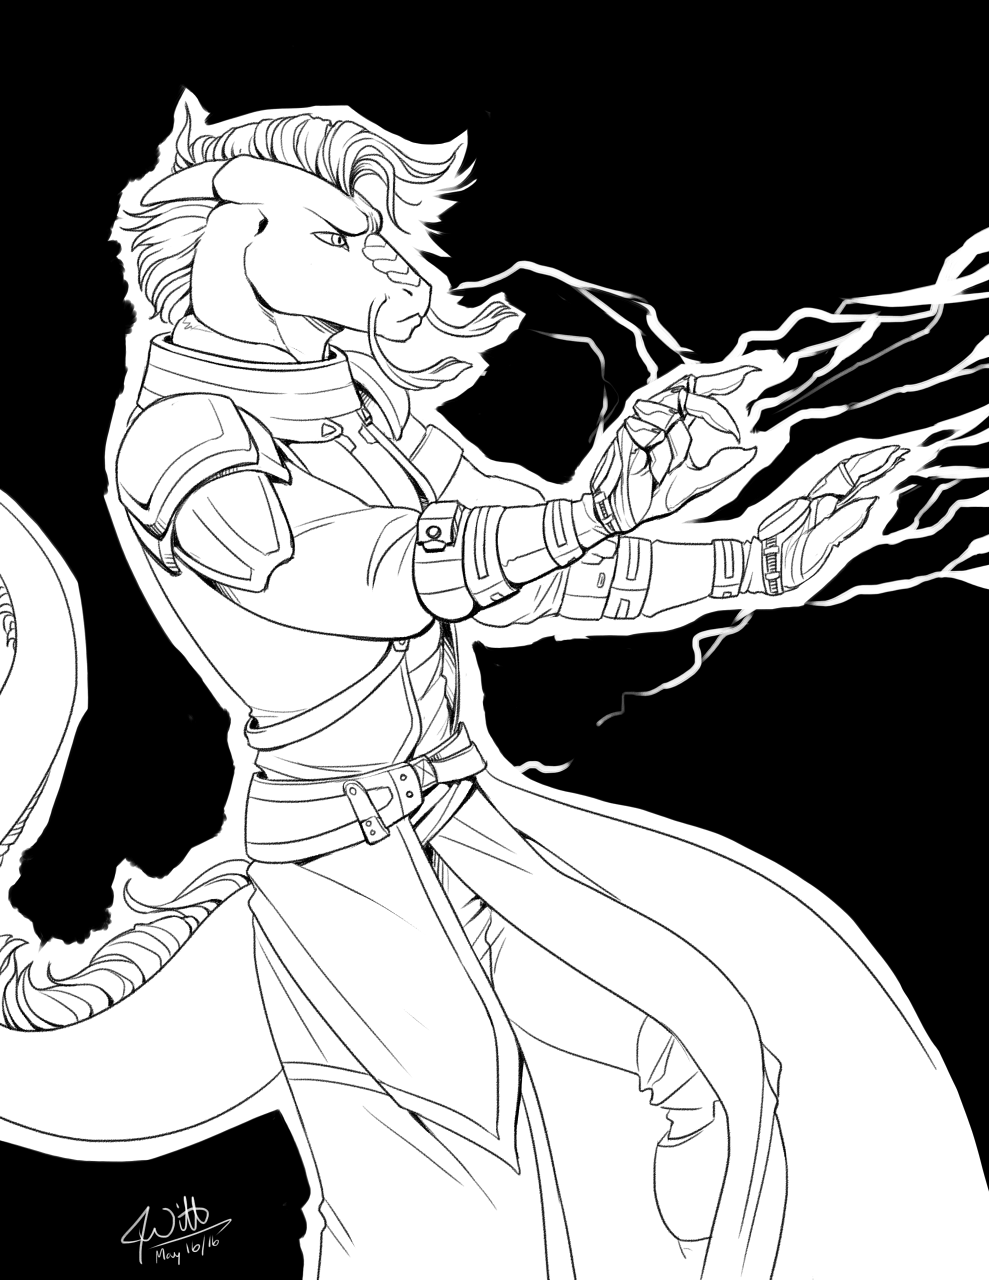 Inked Cosplay - Dev as an Iron Banner Warlock